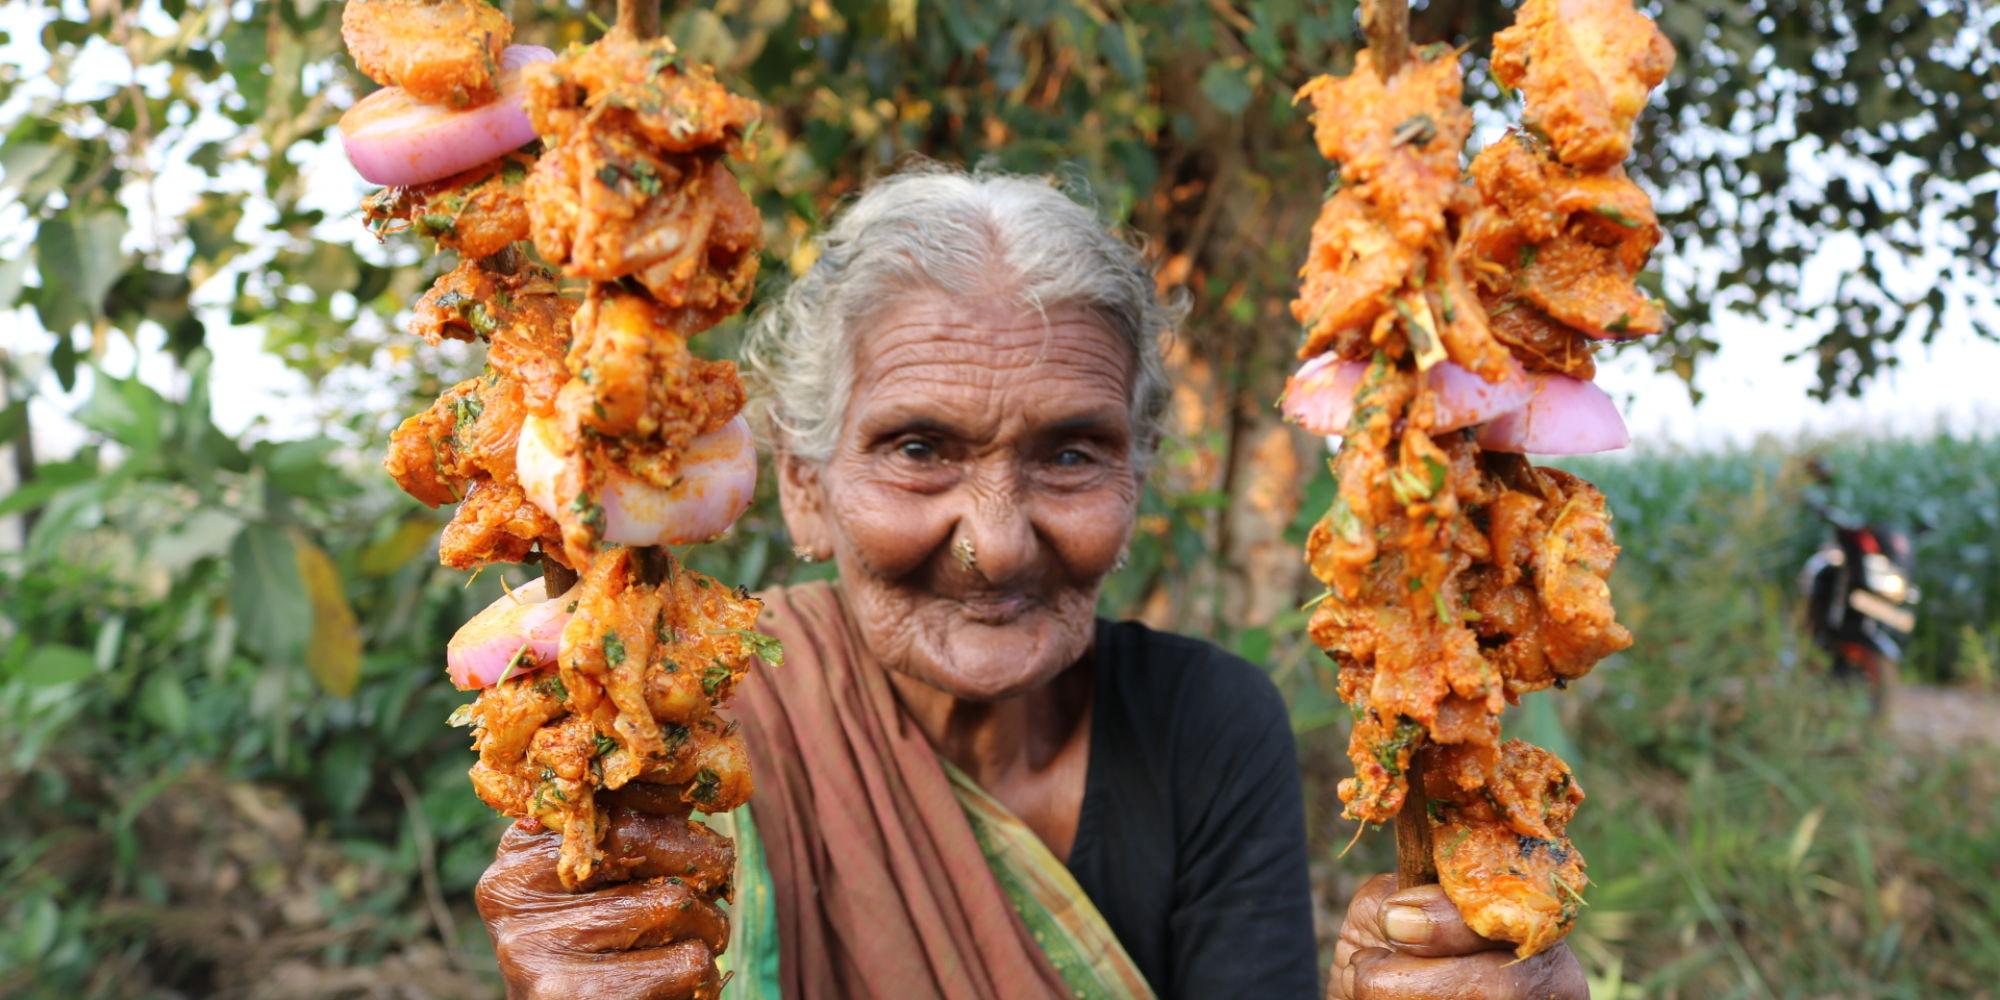 Image result for യൂട്യൂബിൽ സ്വന്തമായി ചാനലുള്ള മസ്തനാമ്മ